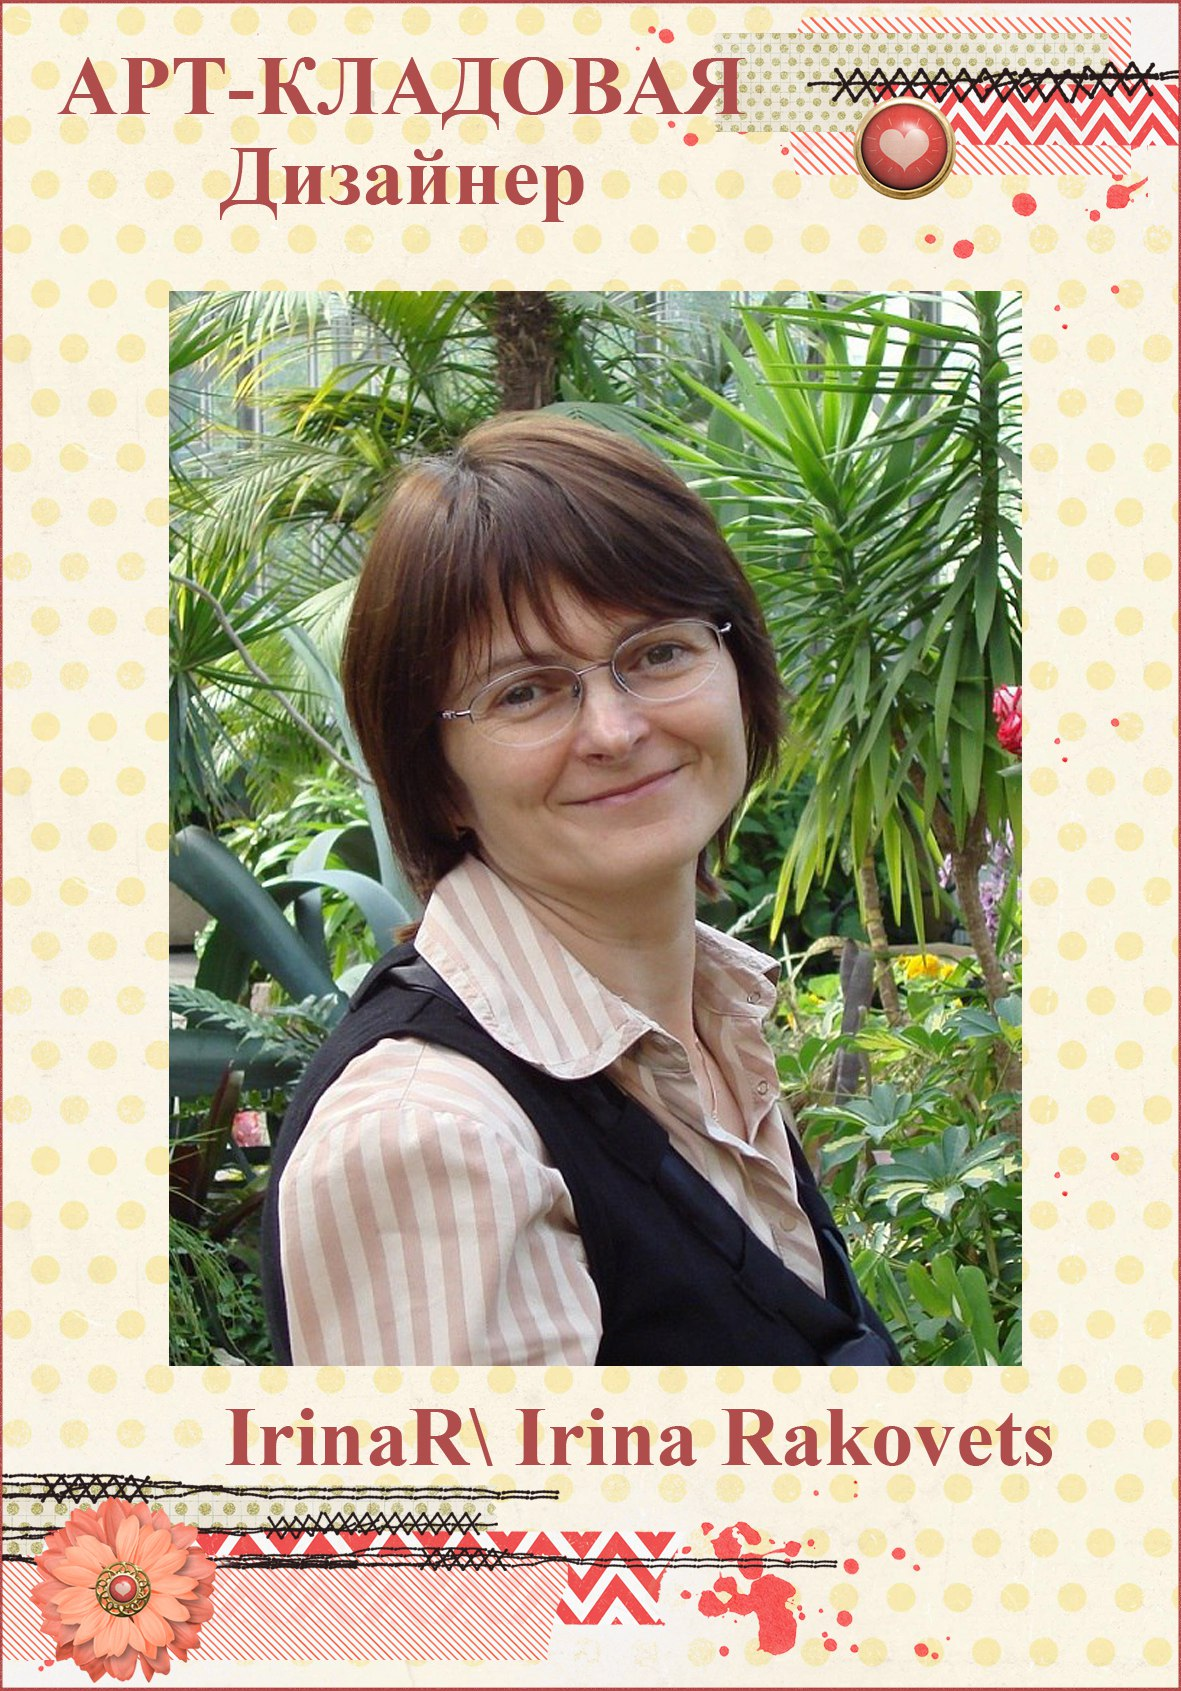 Ирина Раковец